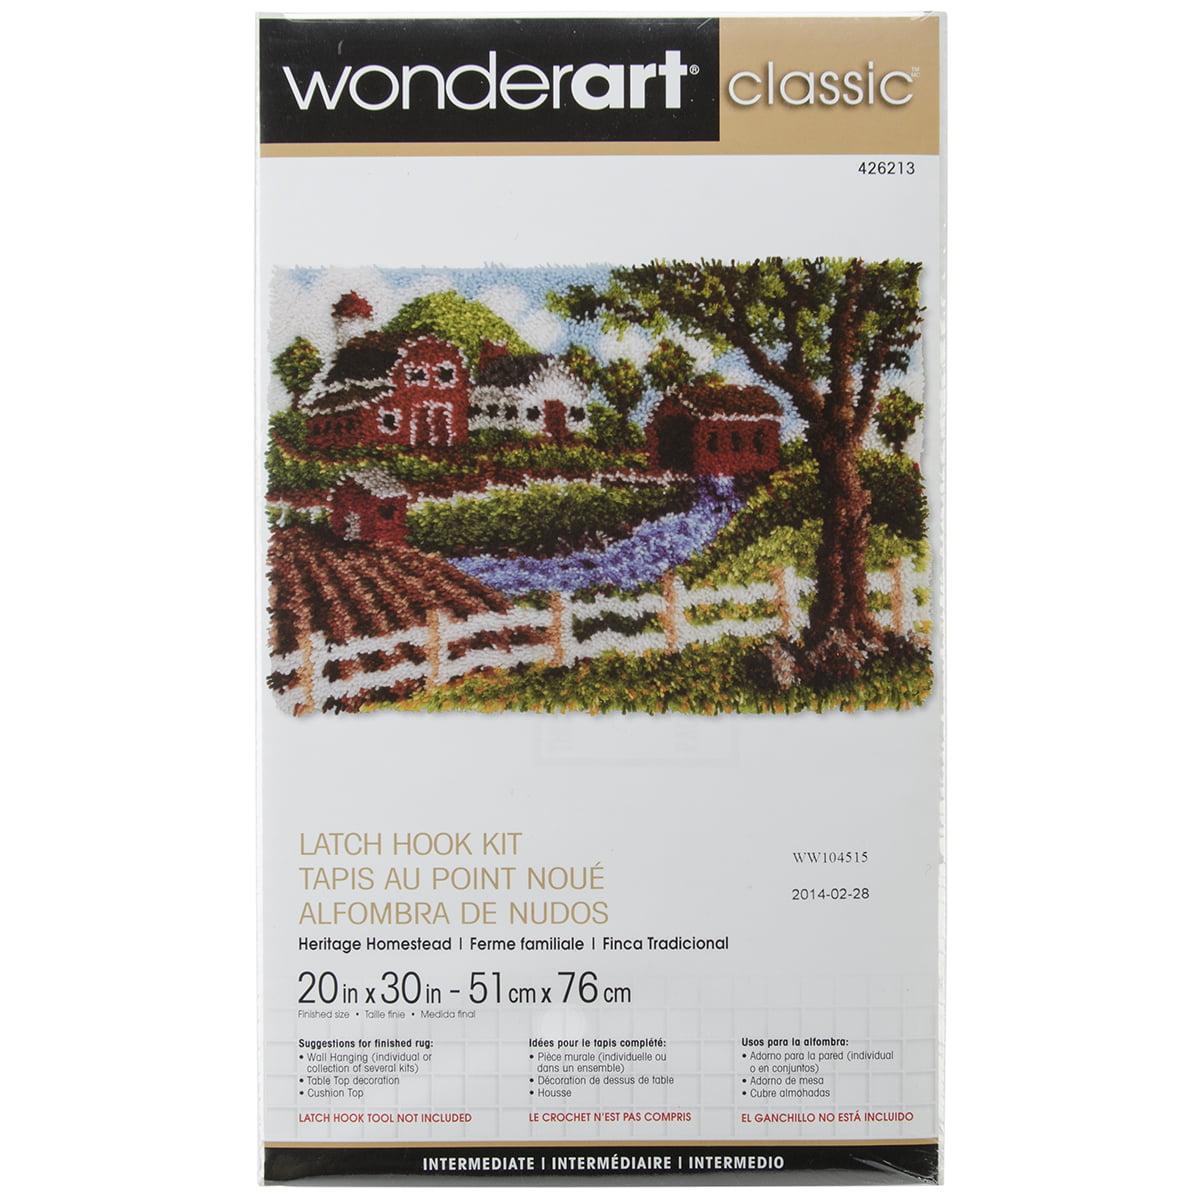 "Wonderart Classic Latch Hook Kit, 20"" x 30"", Heritage Homestead"